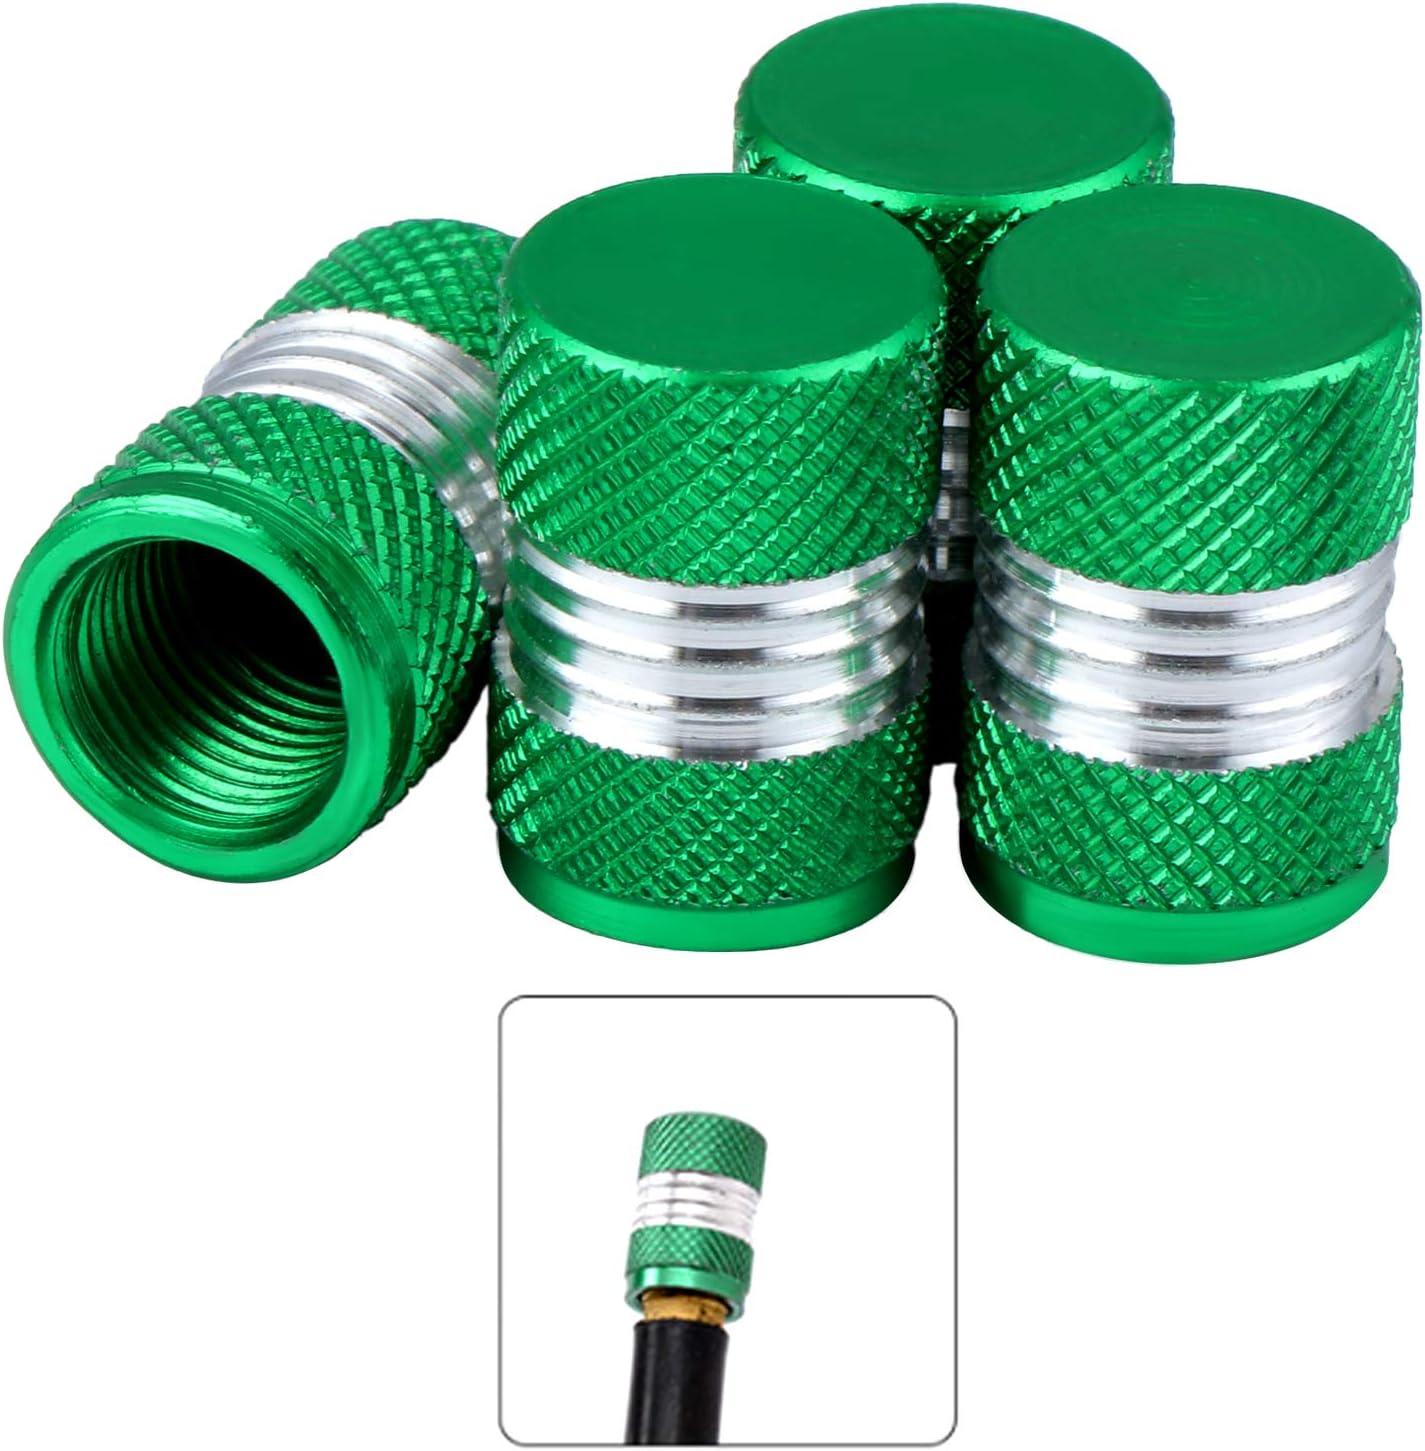 Fippy 40 PCS Tapa de la v/álvula Aleaci/ón de Aluminio anodizado Tapas de la v/álvula del neum/ático del Coche Tapas Antipolvo Estilo